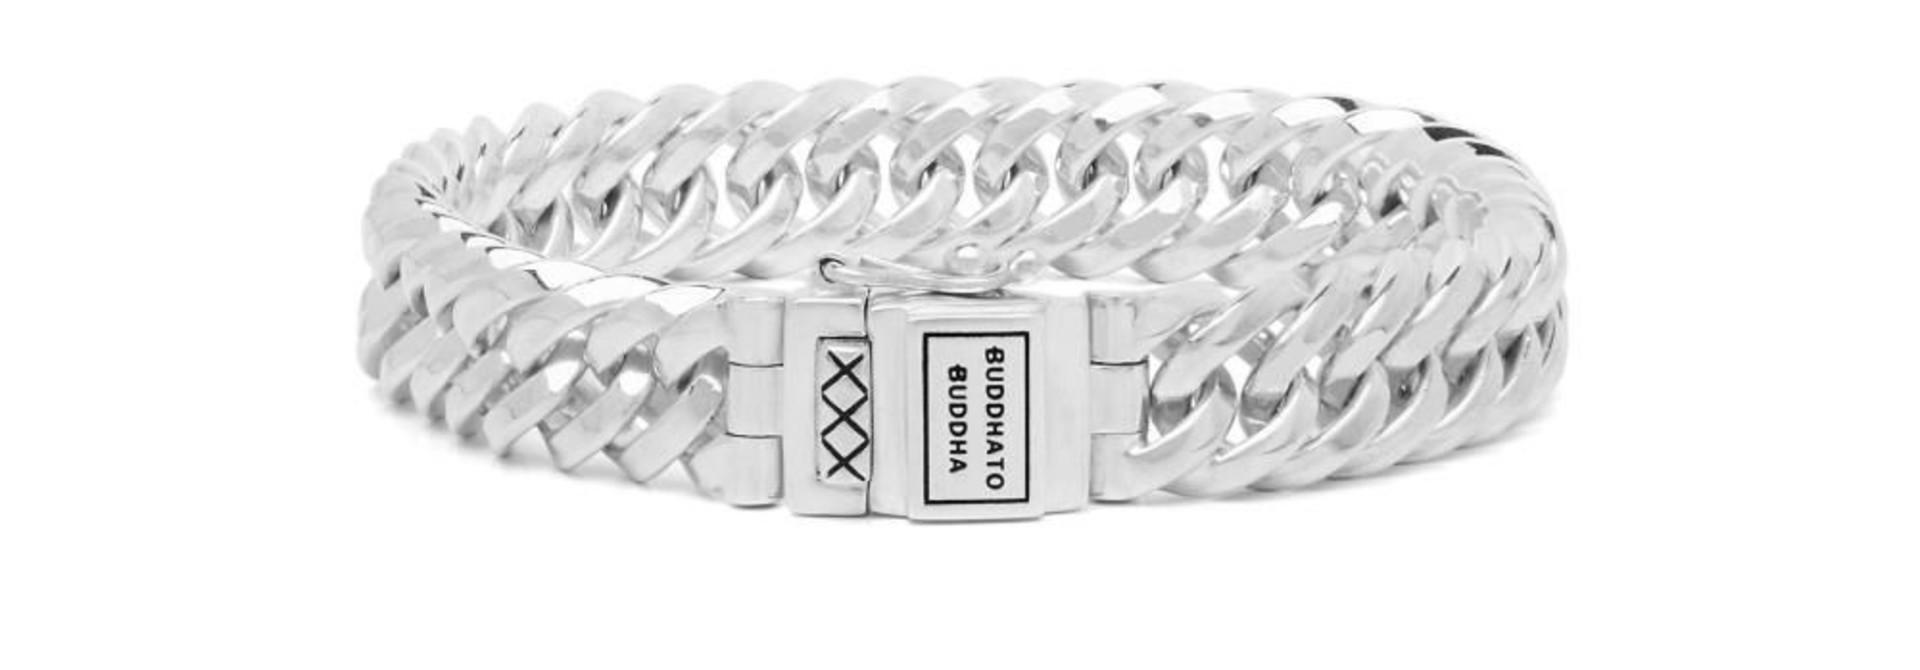 Chain XS Bracelet